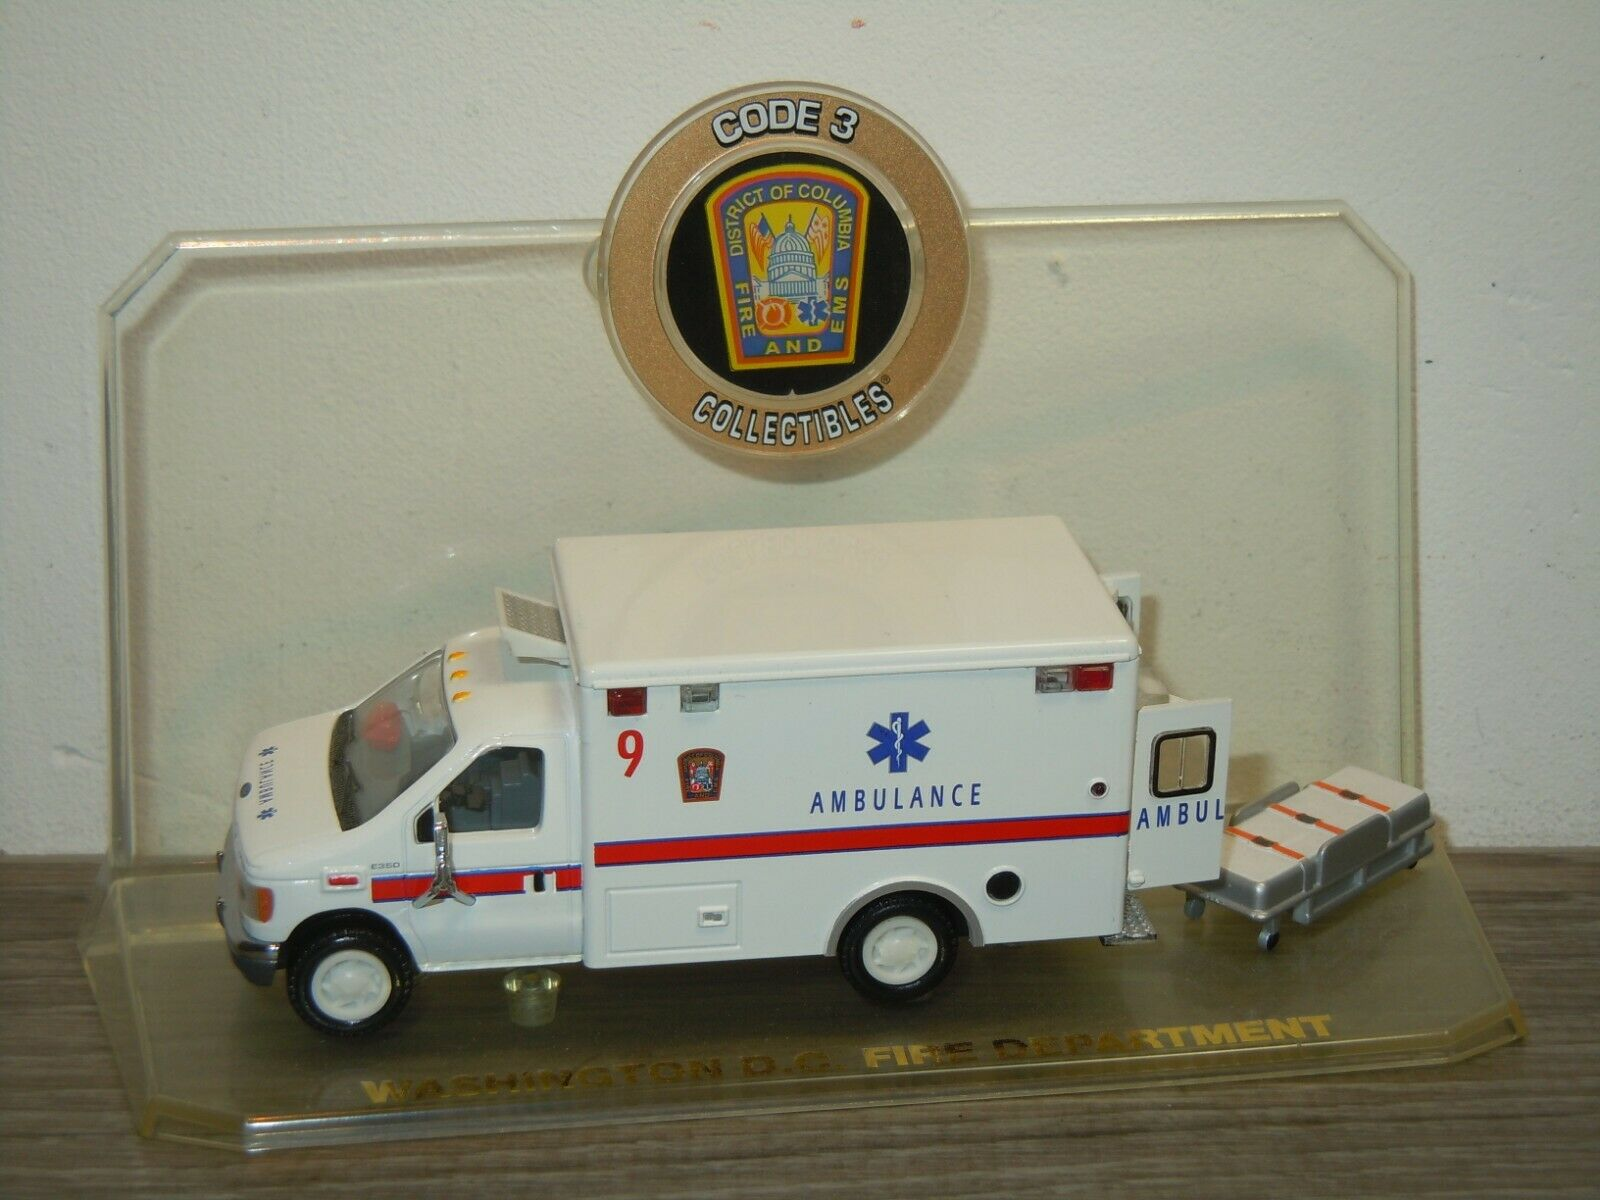 Ford Washington DC Fire DepartHommest - Code  3 Collectibles 1 64 37339  prix de gros